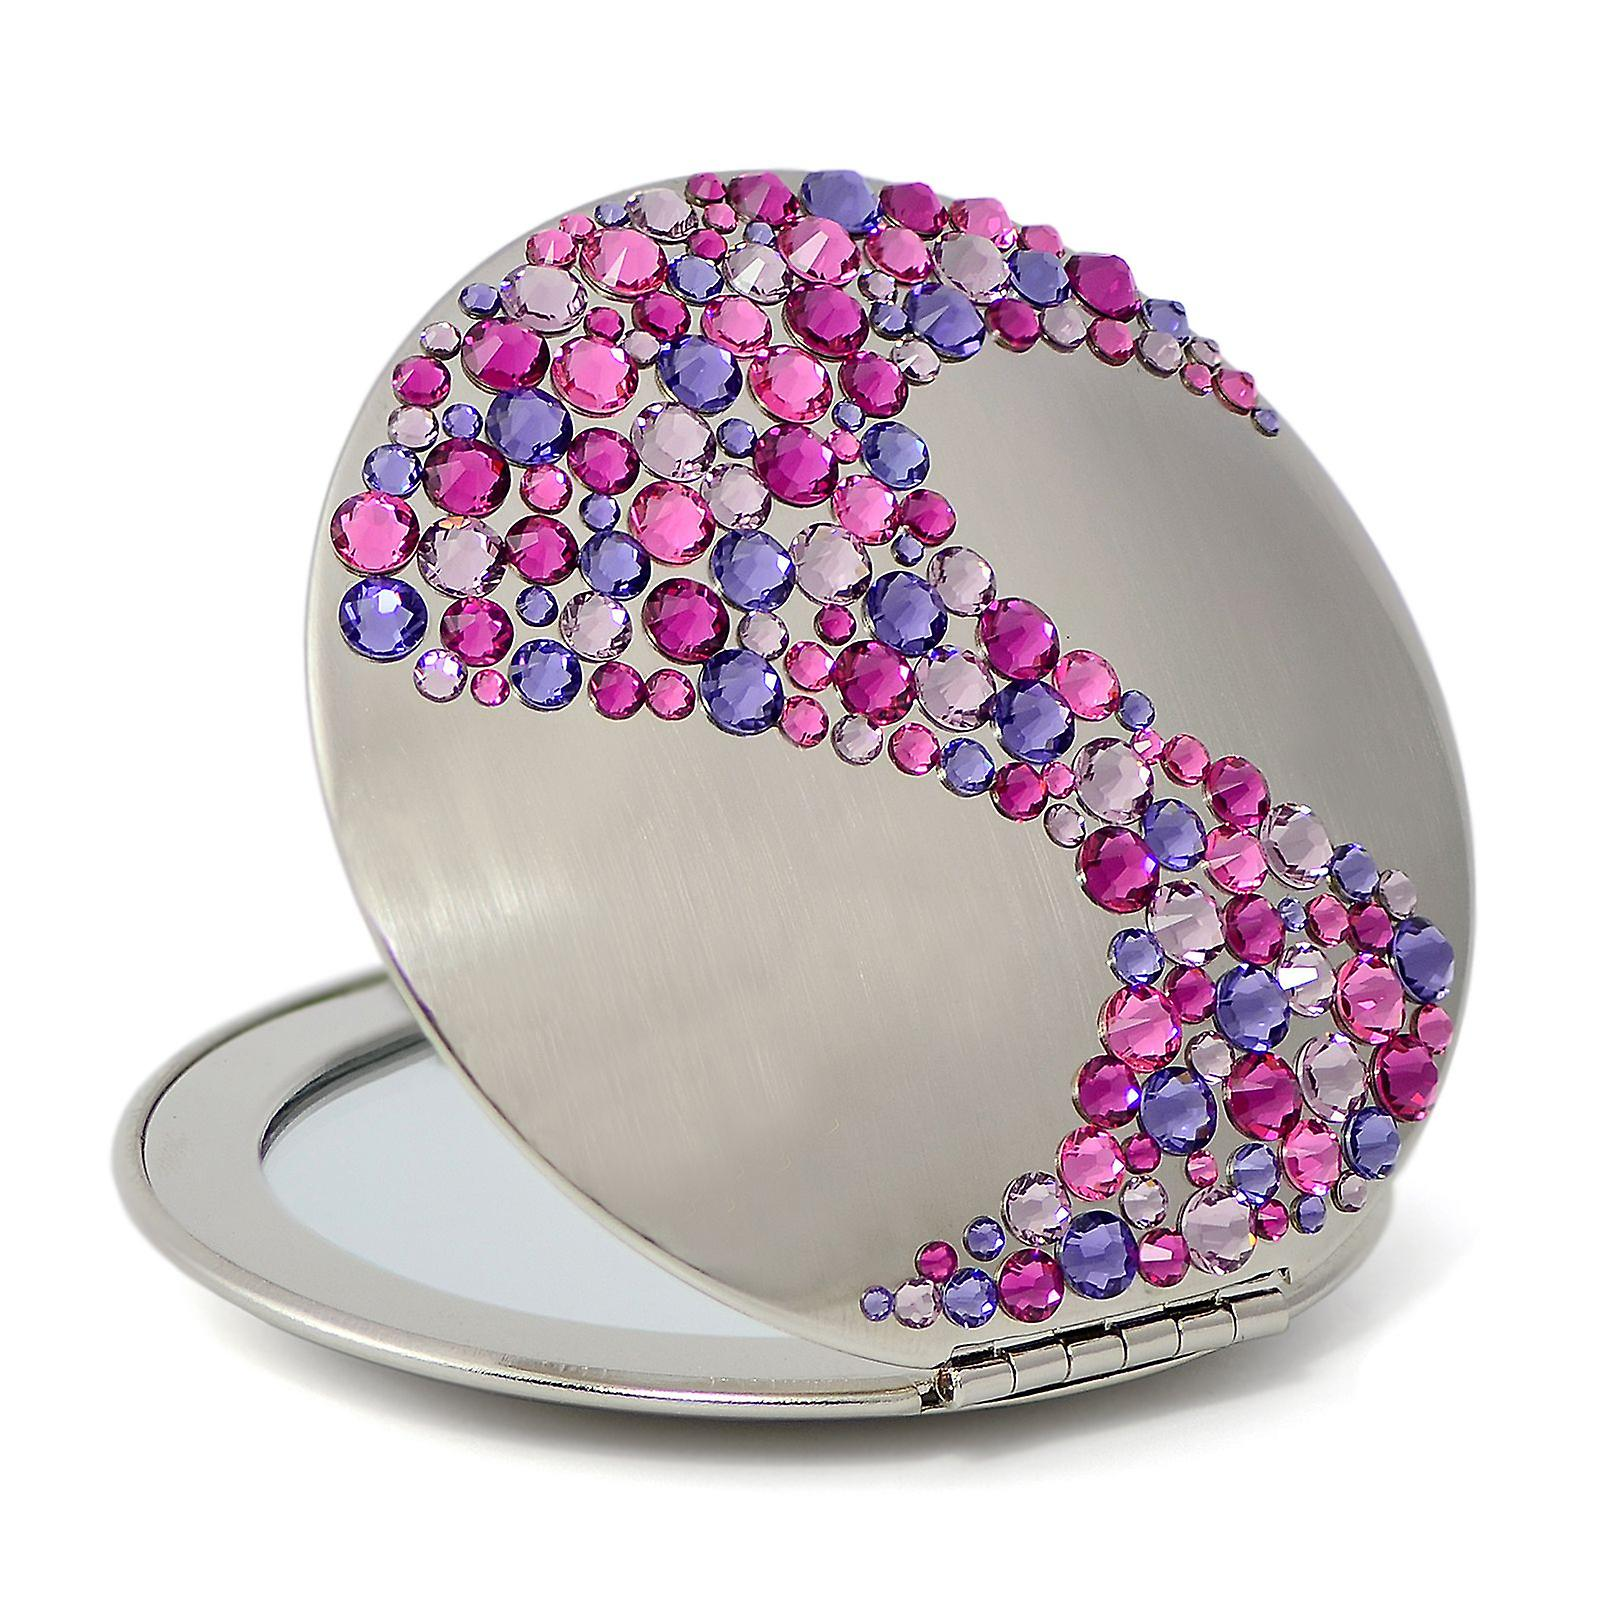 Luxury compact mirror ACS-08.4